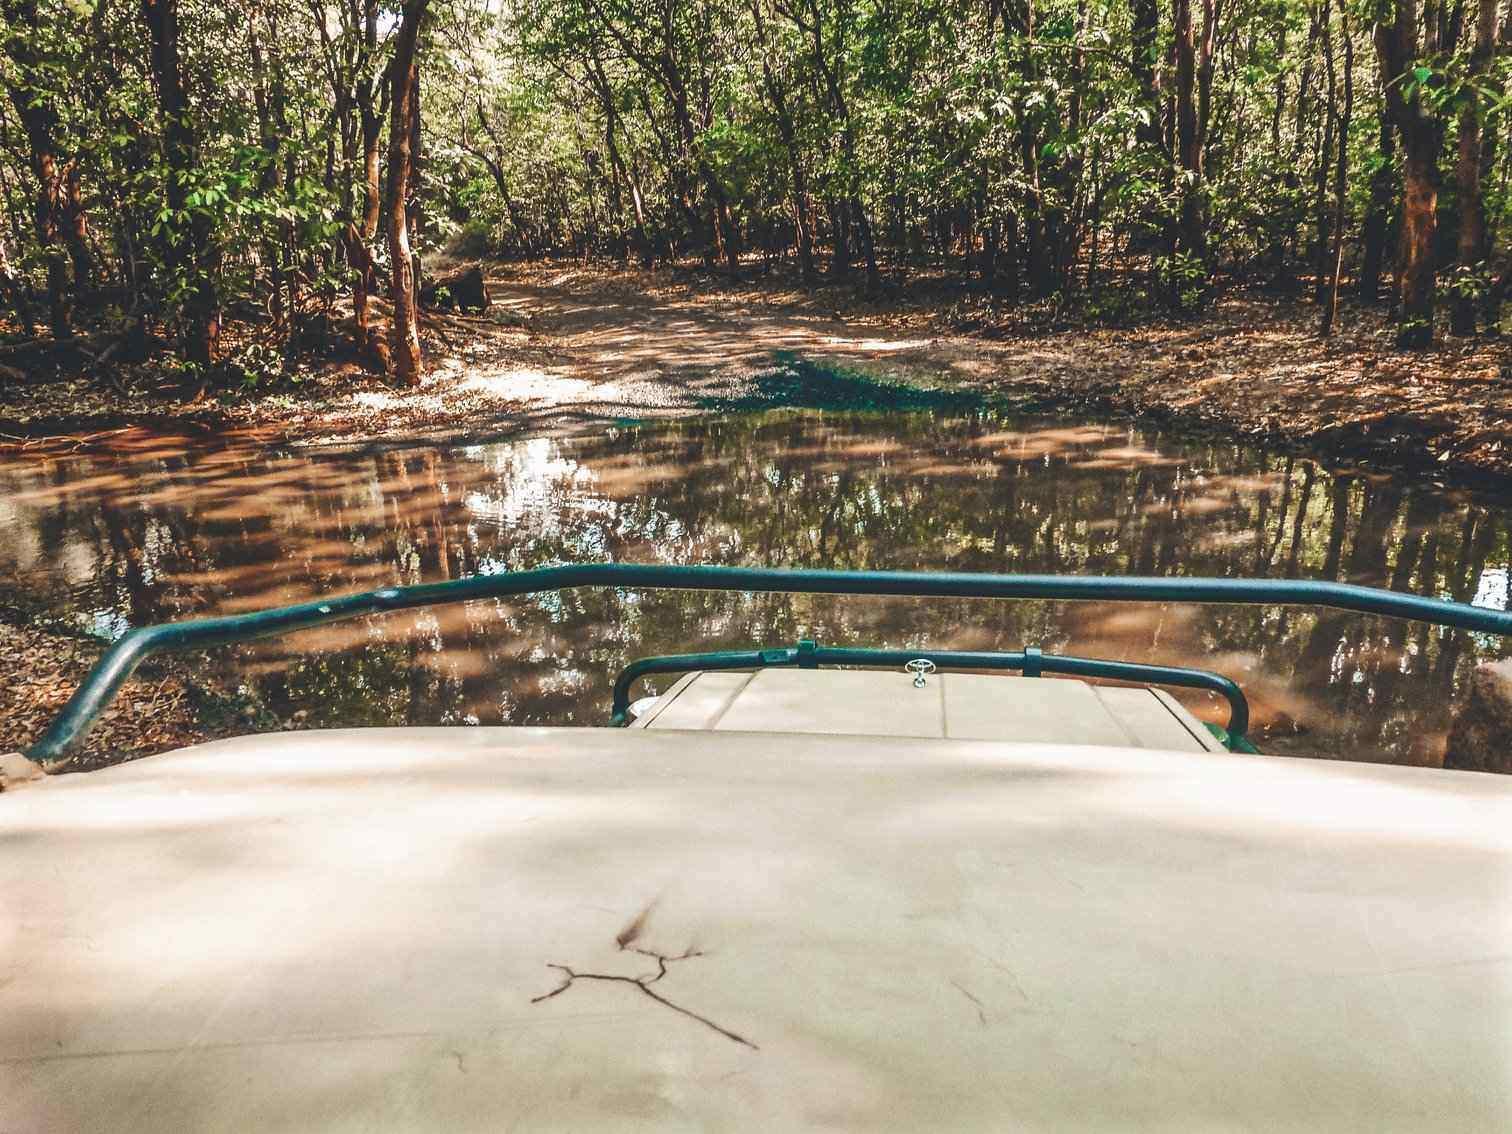 Tanzanian Safari Jeep